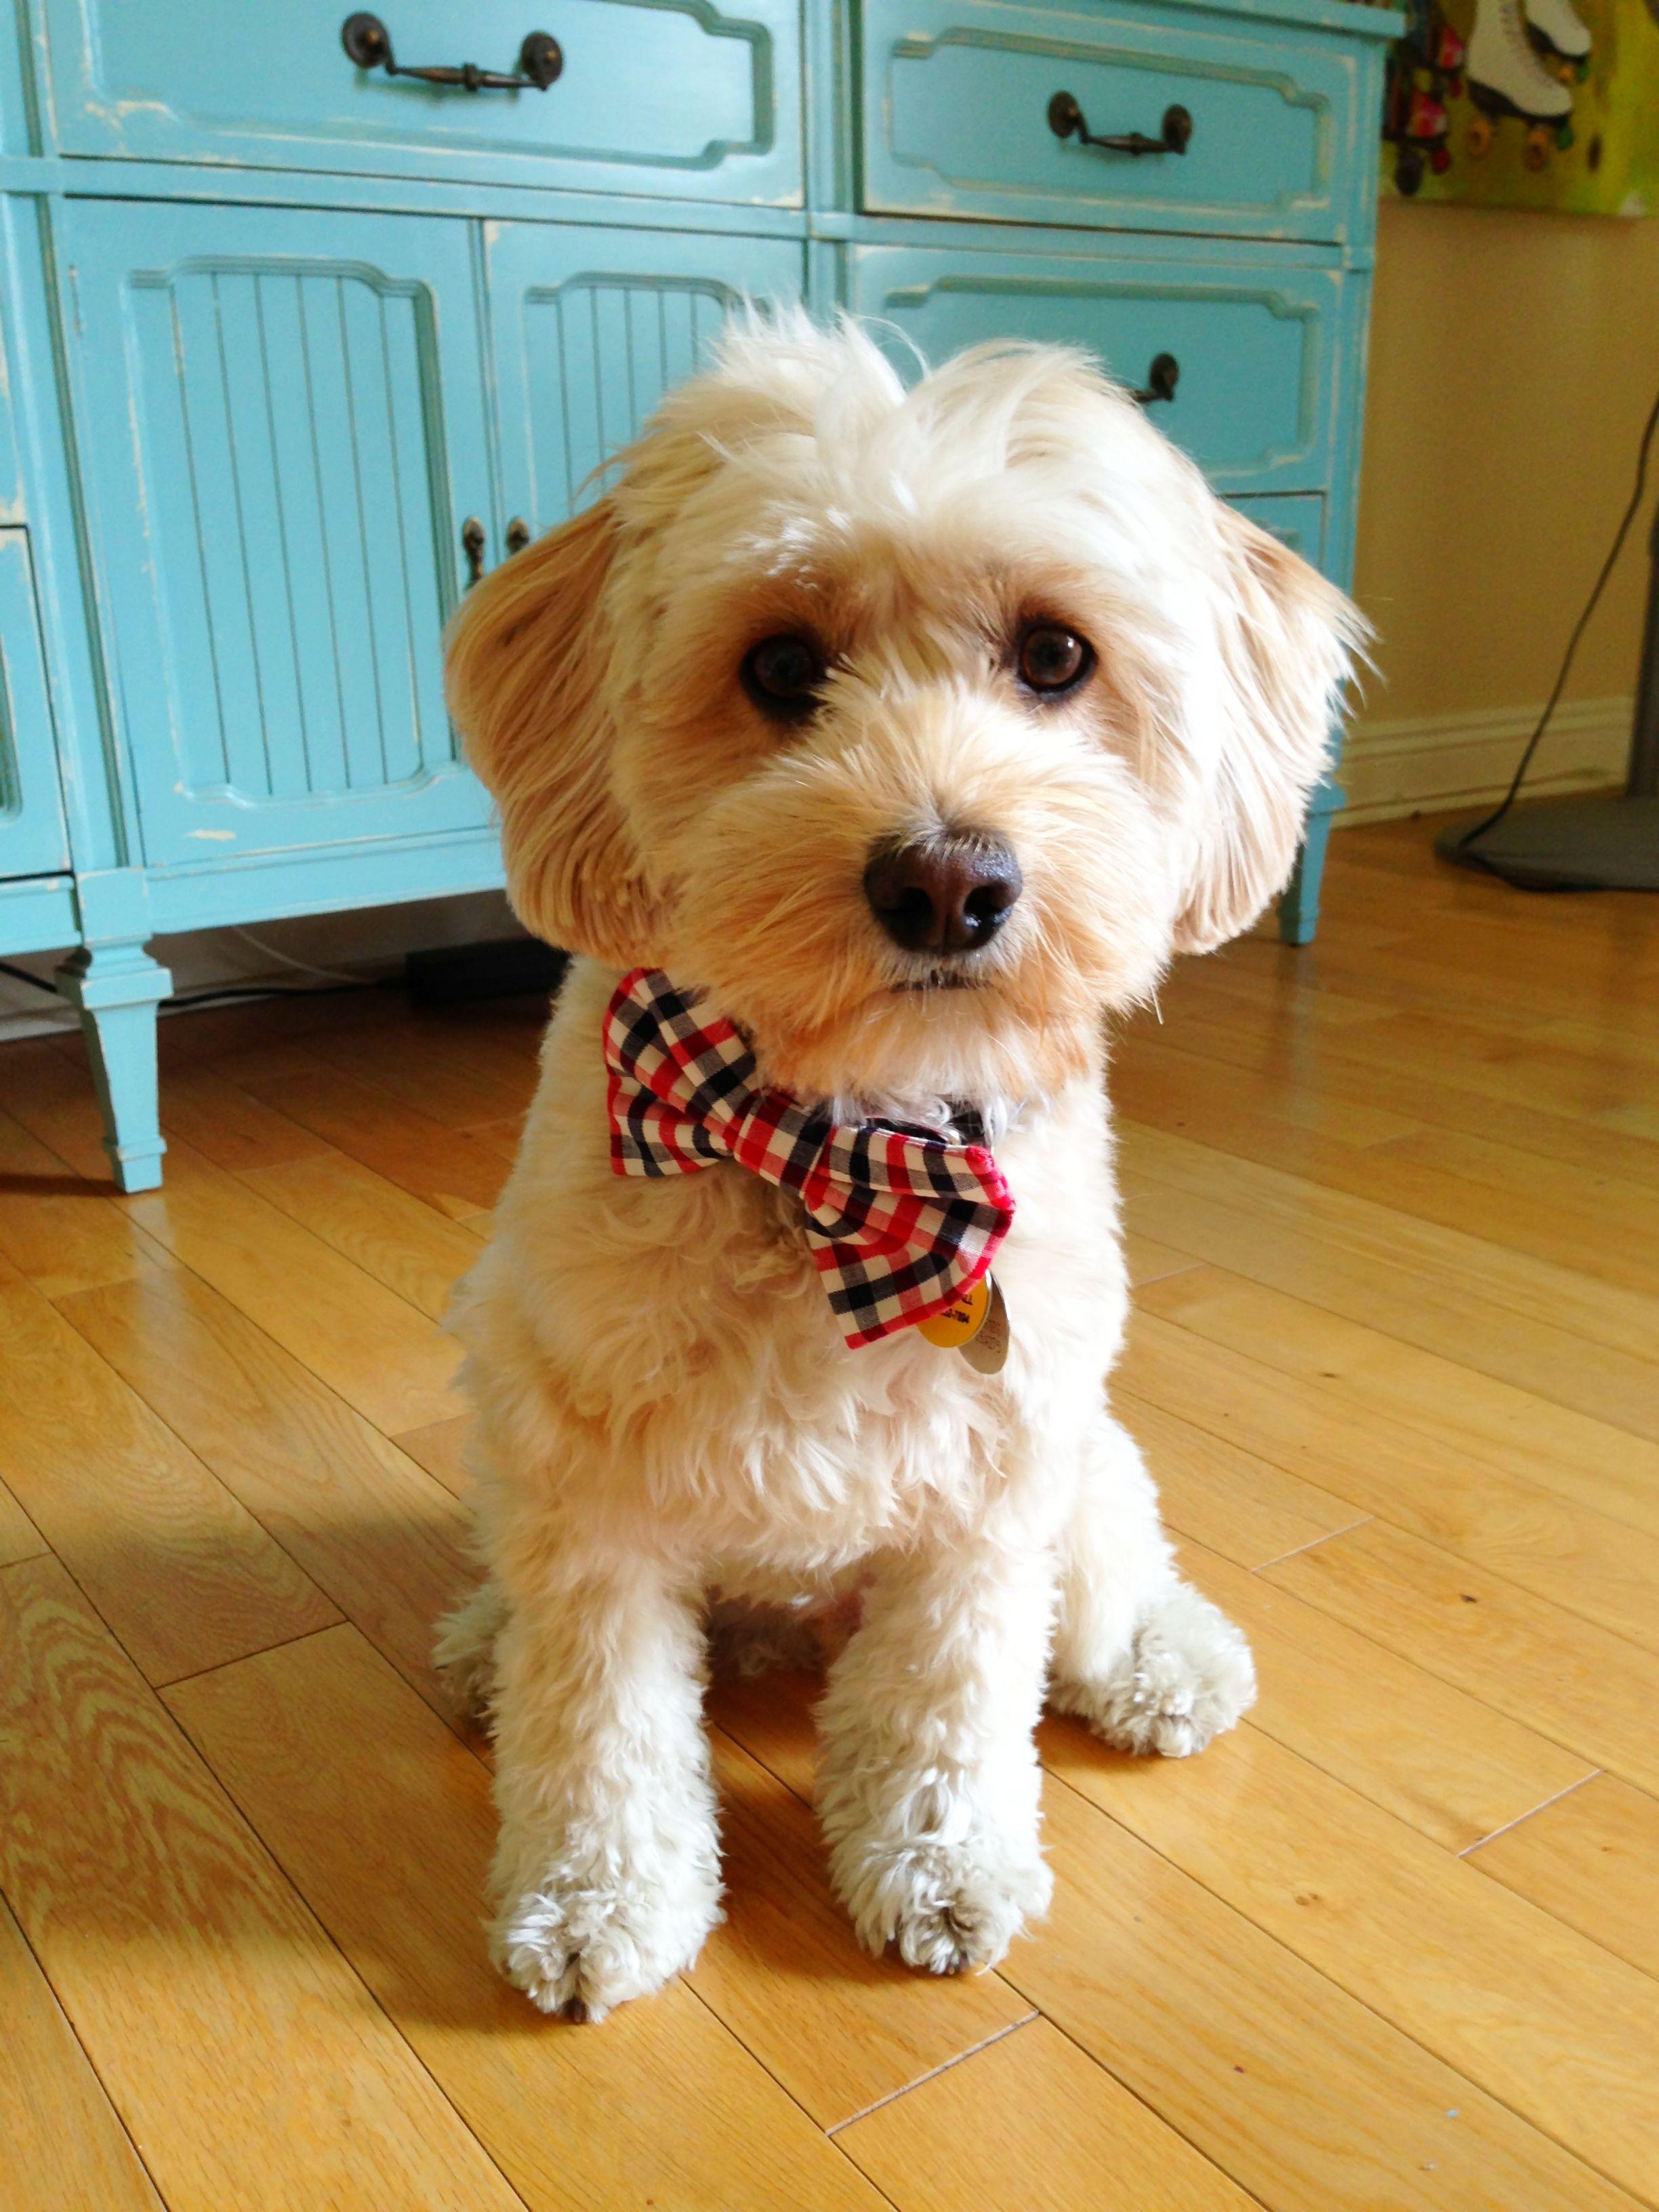 Good Bow Tie Bow Adorable Dog - cbf4abb7dc2d0a471efe921cd5e045ab  Collection_314290  .jpg